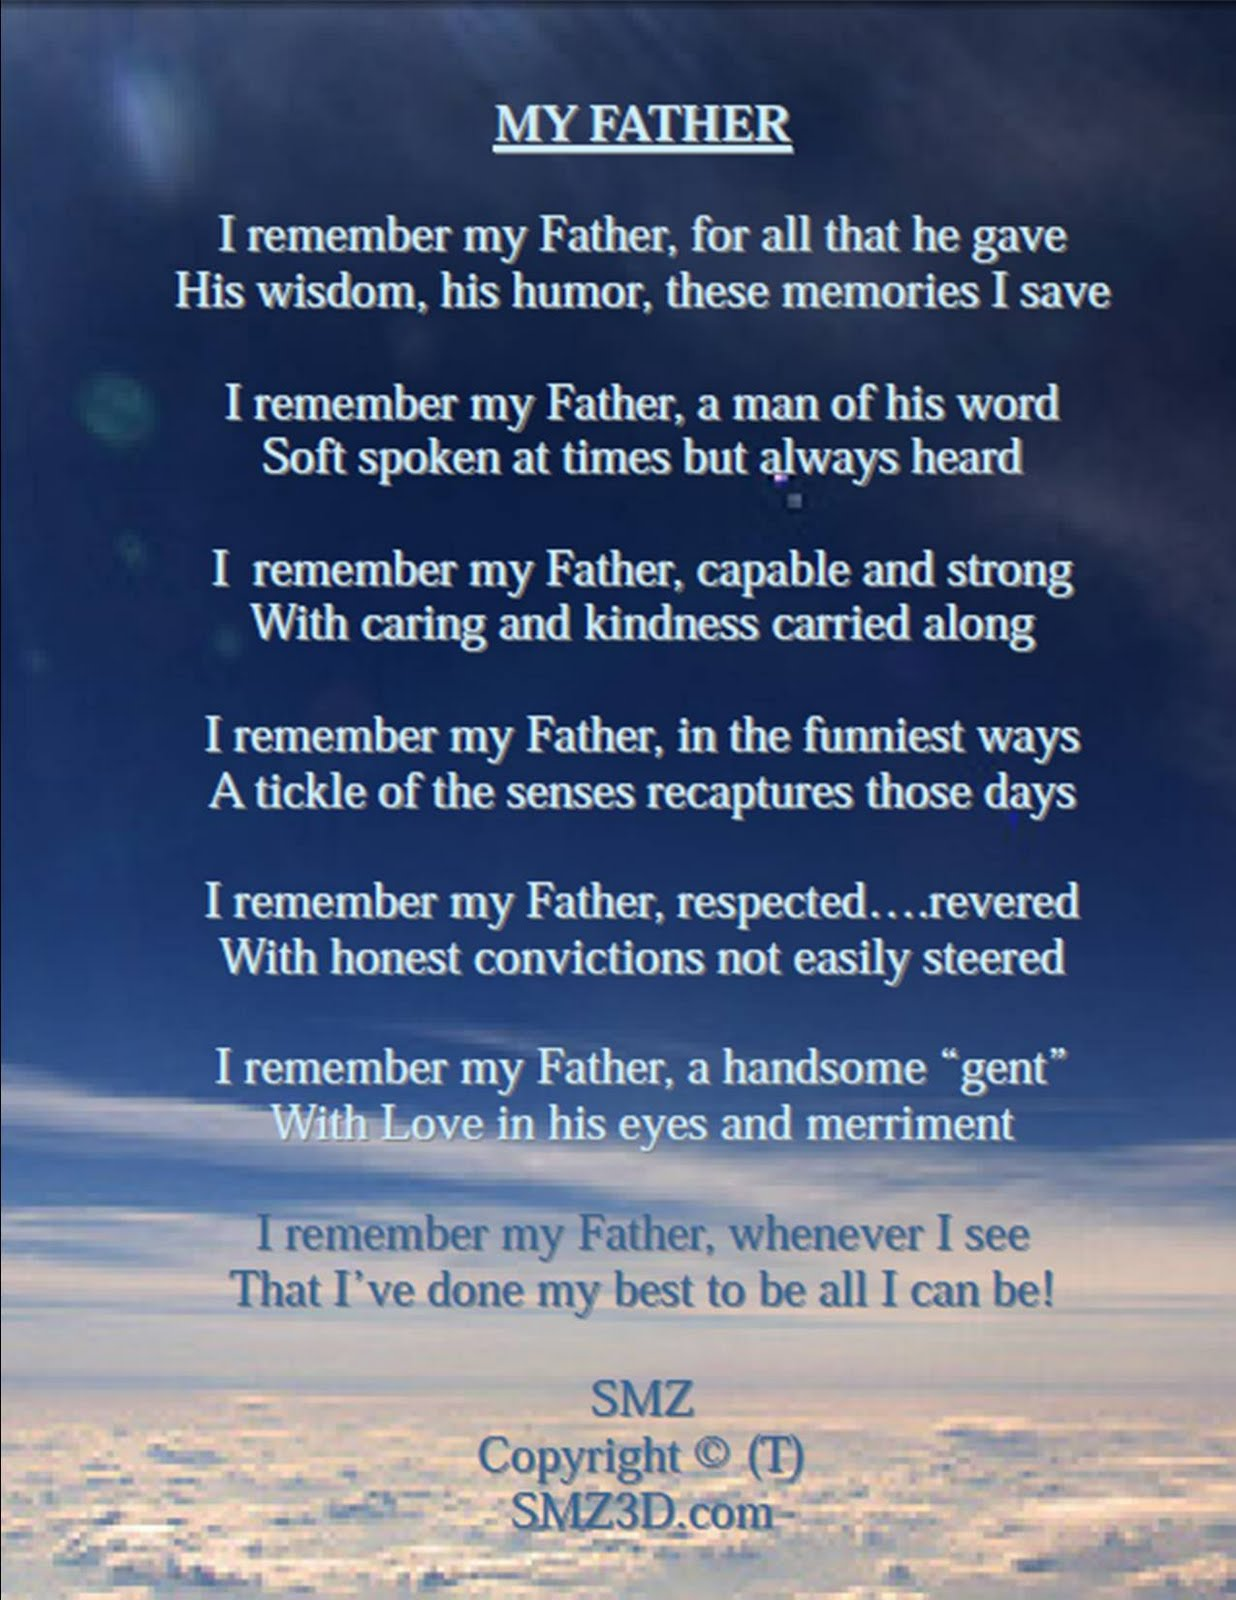 Father Passing Away Quotes Inspirational. QuotesGram